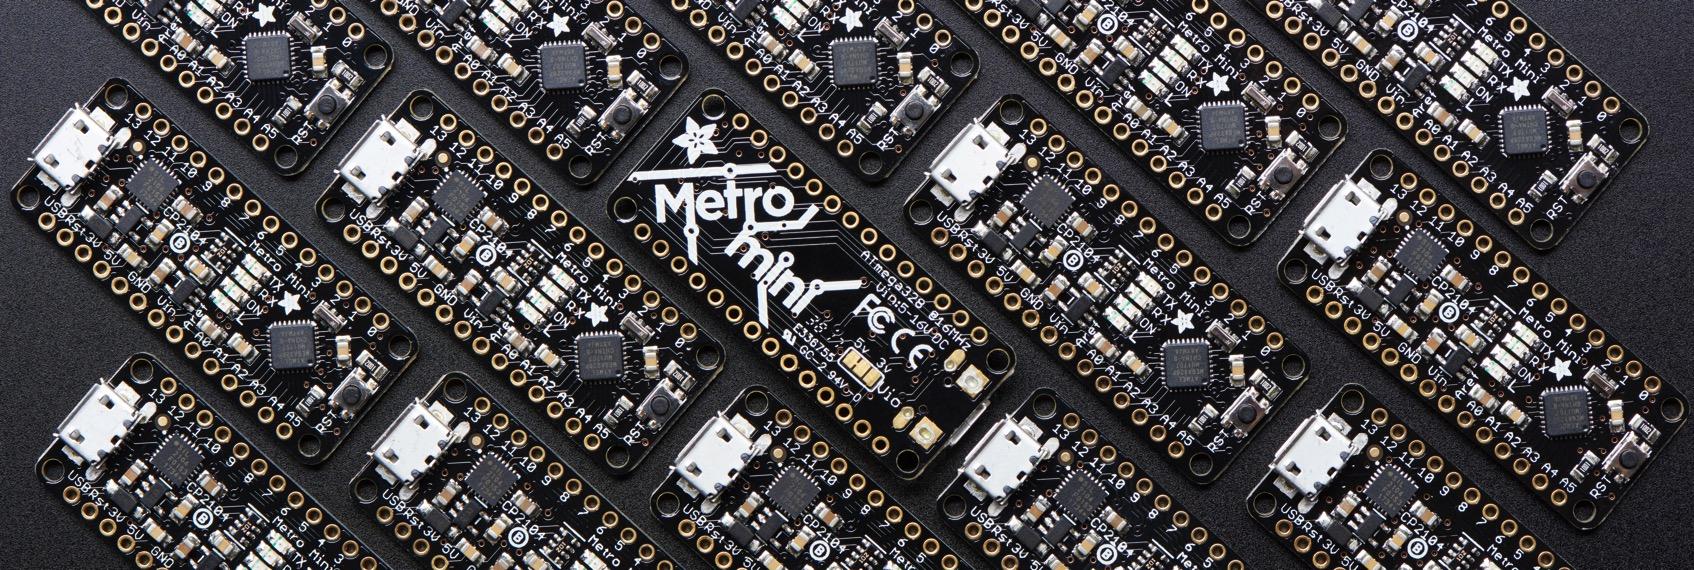 Metro Mini banner ORIG 2018 03